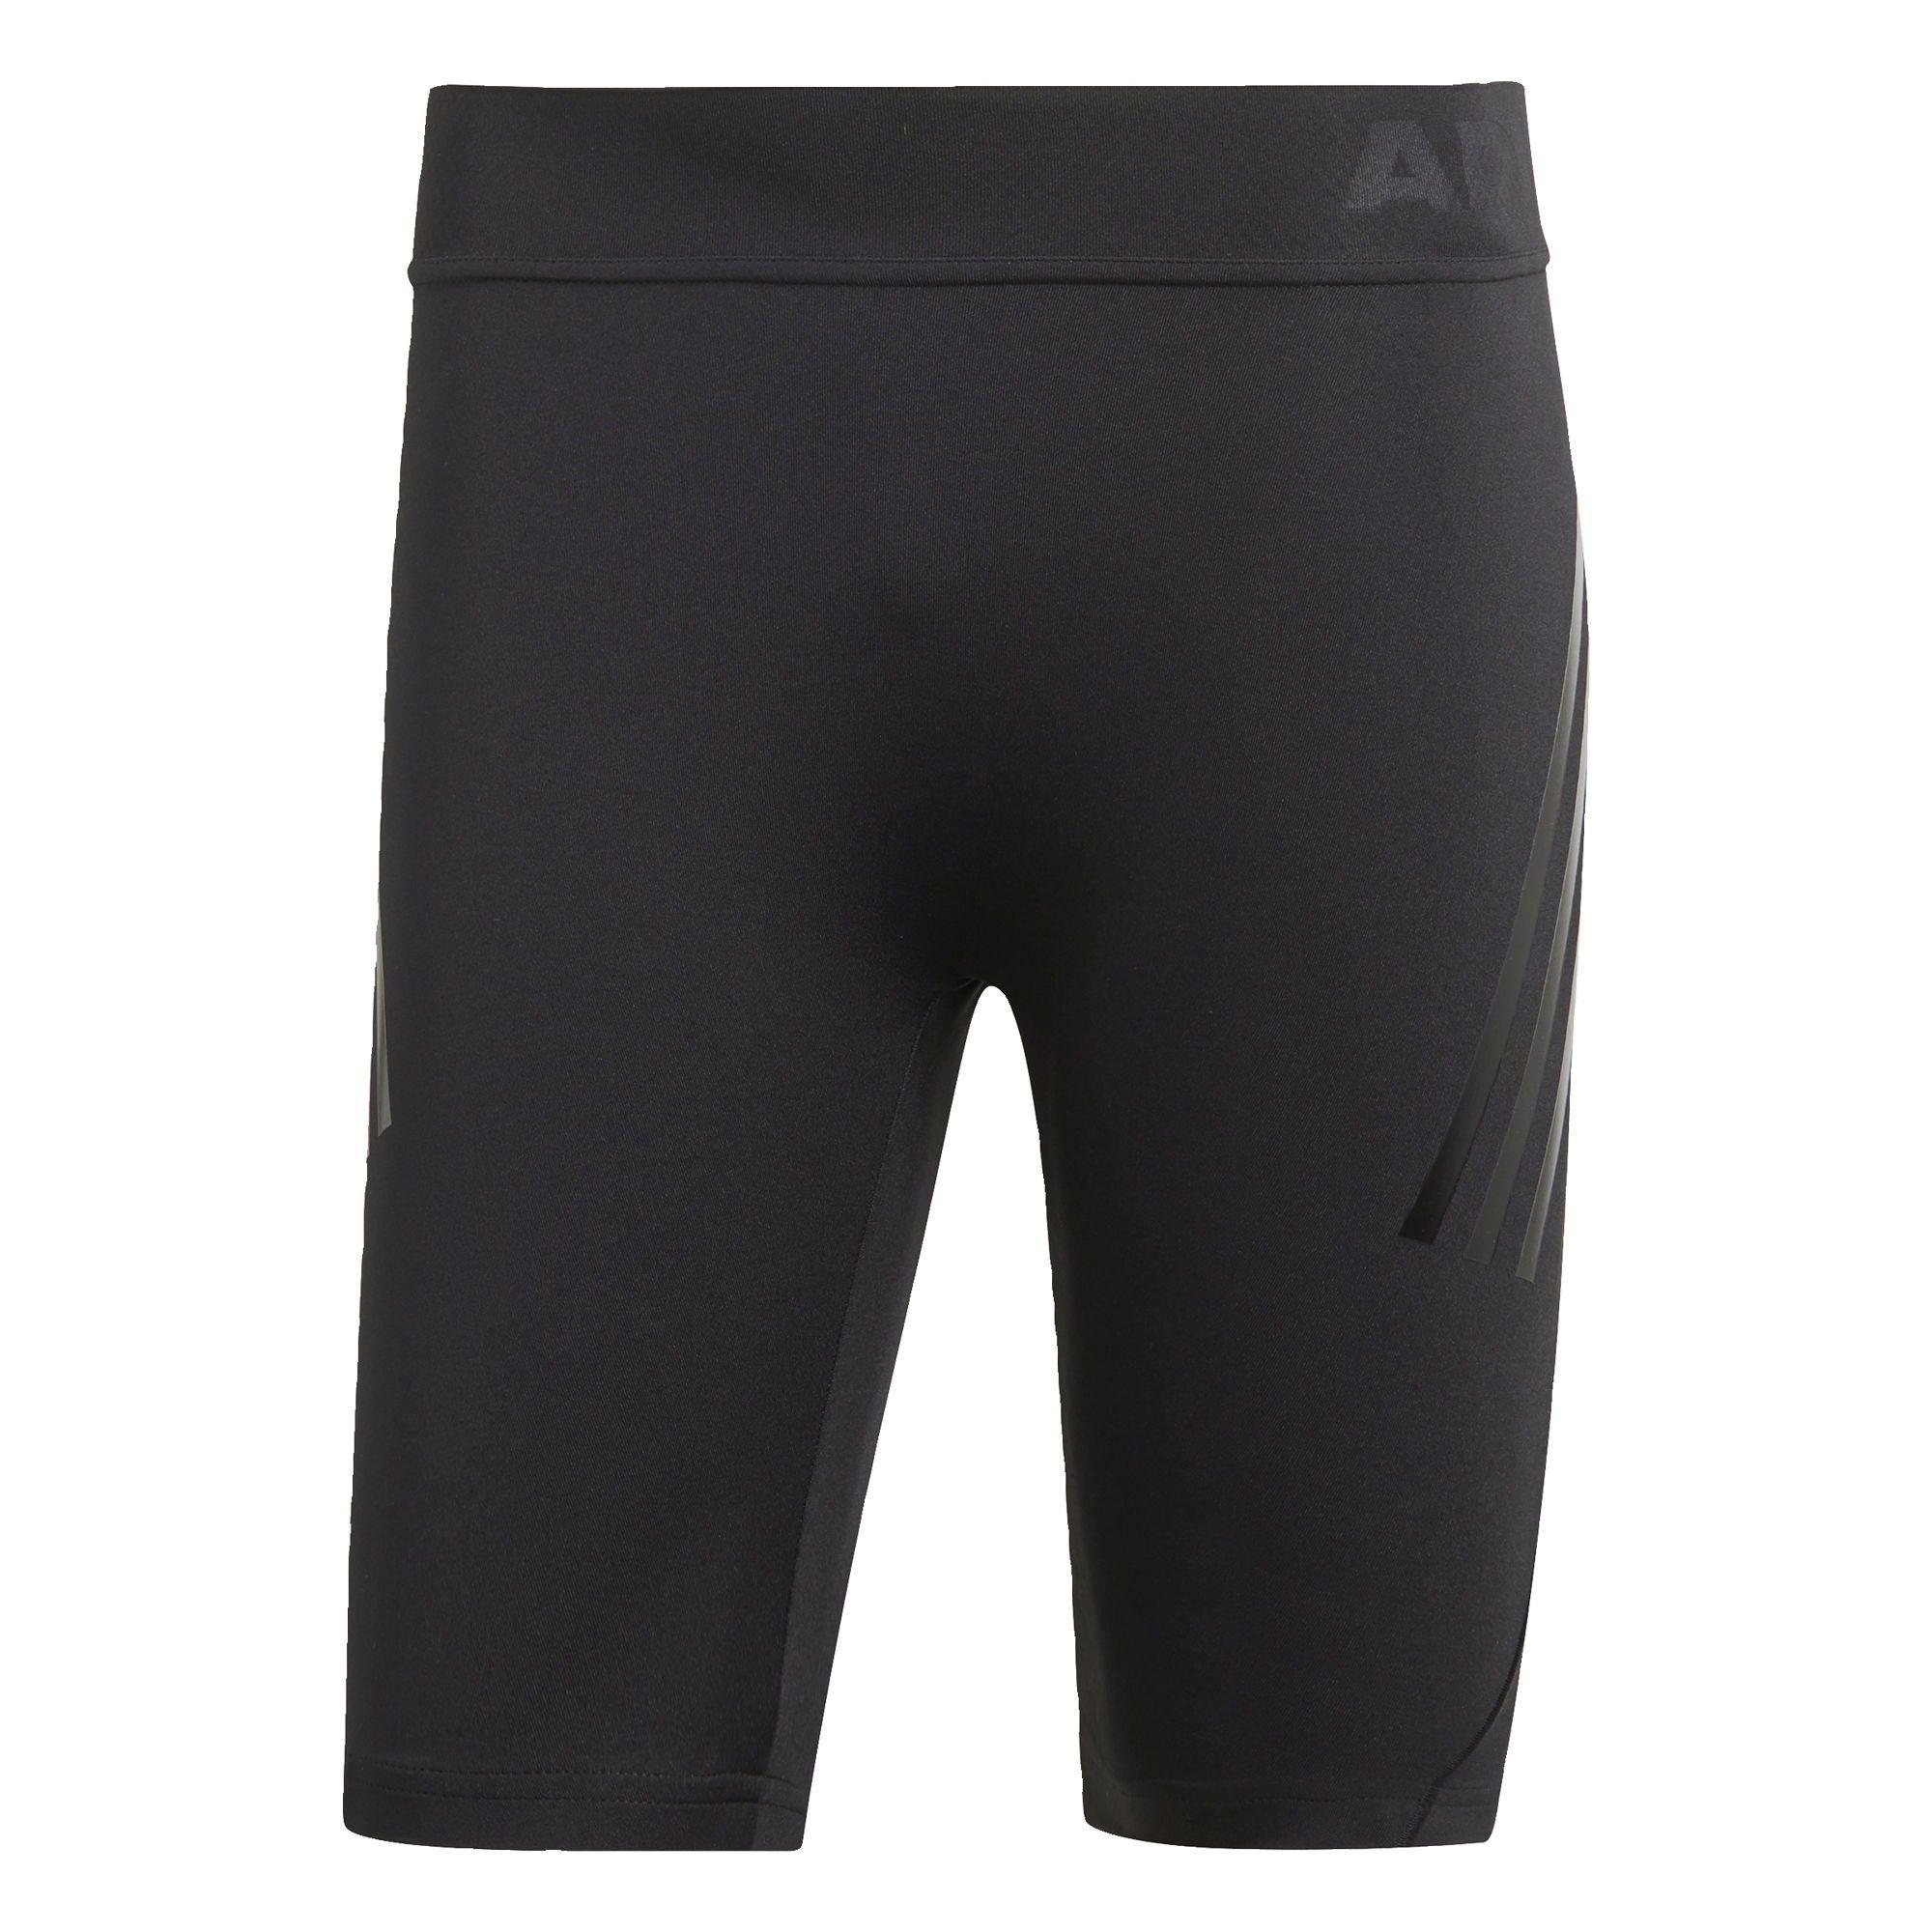 adidas Performance Shorts »Alphaskin Tech kurze 3 Streifen Tight« Clima;AlphaSkin online kaufen | OTTO